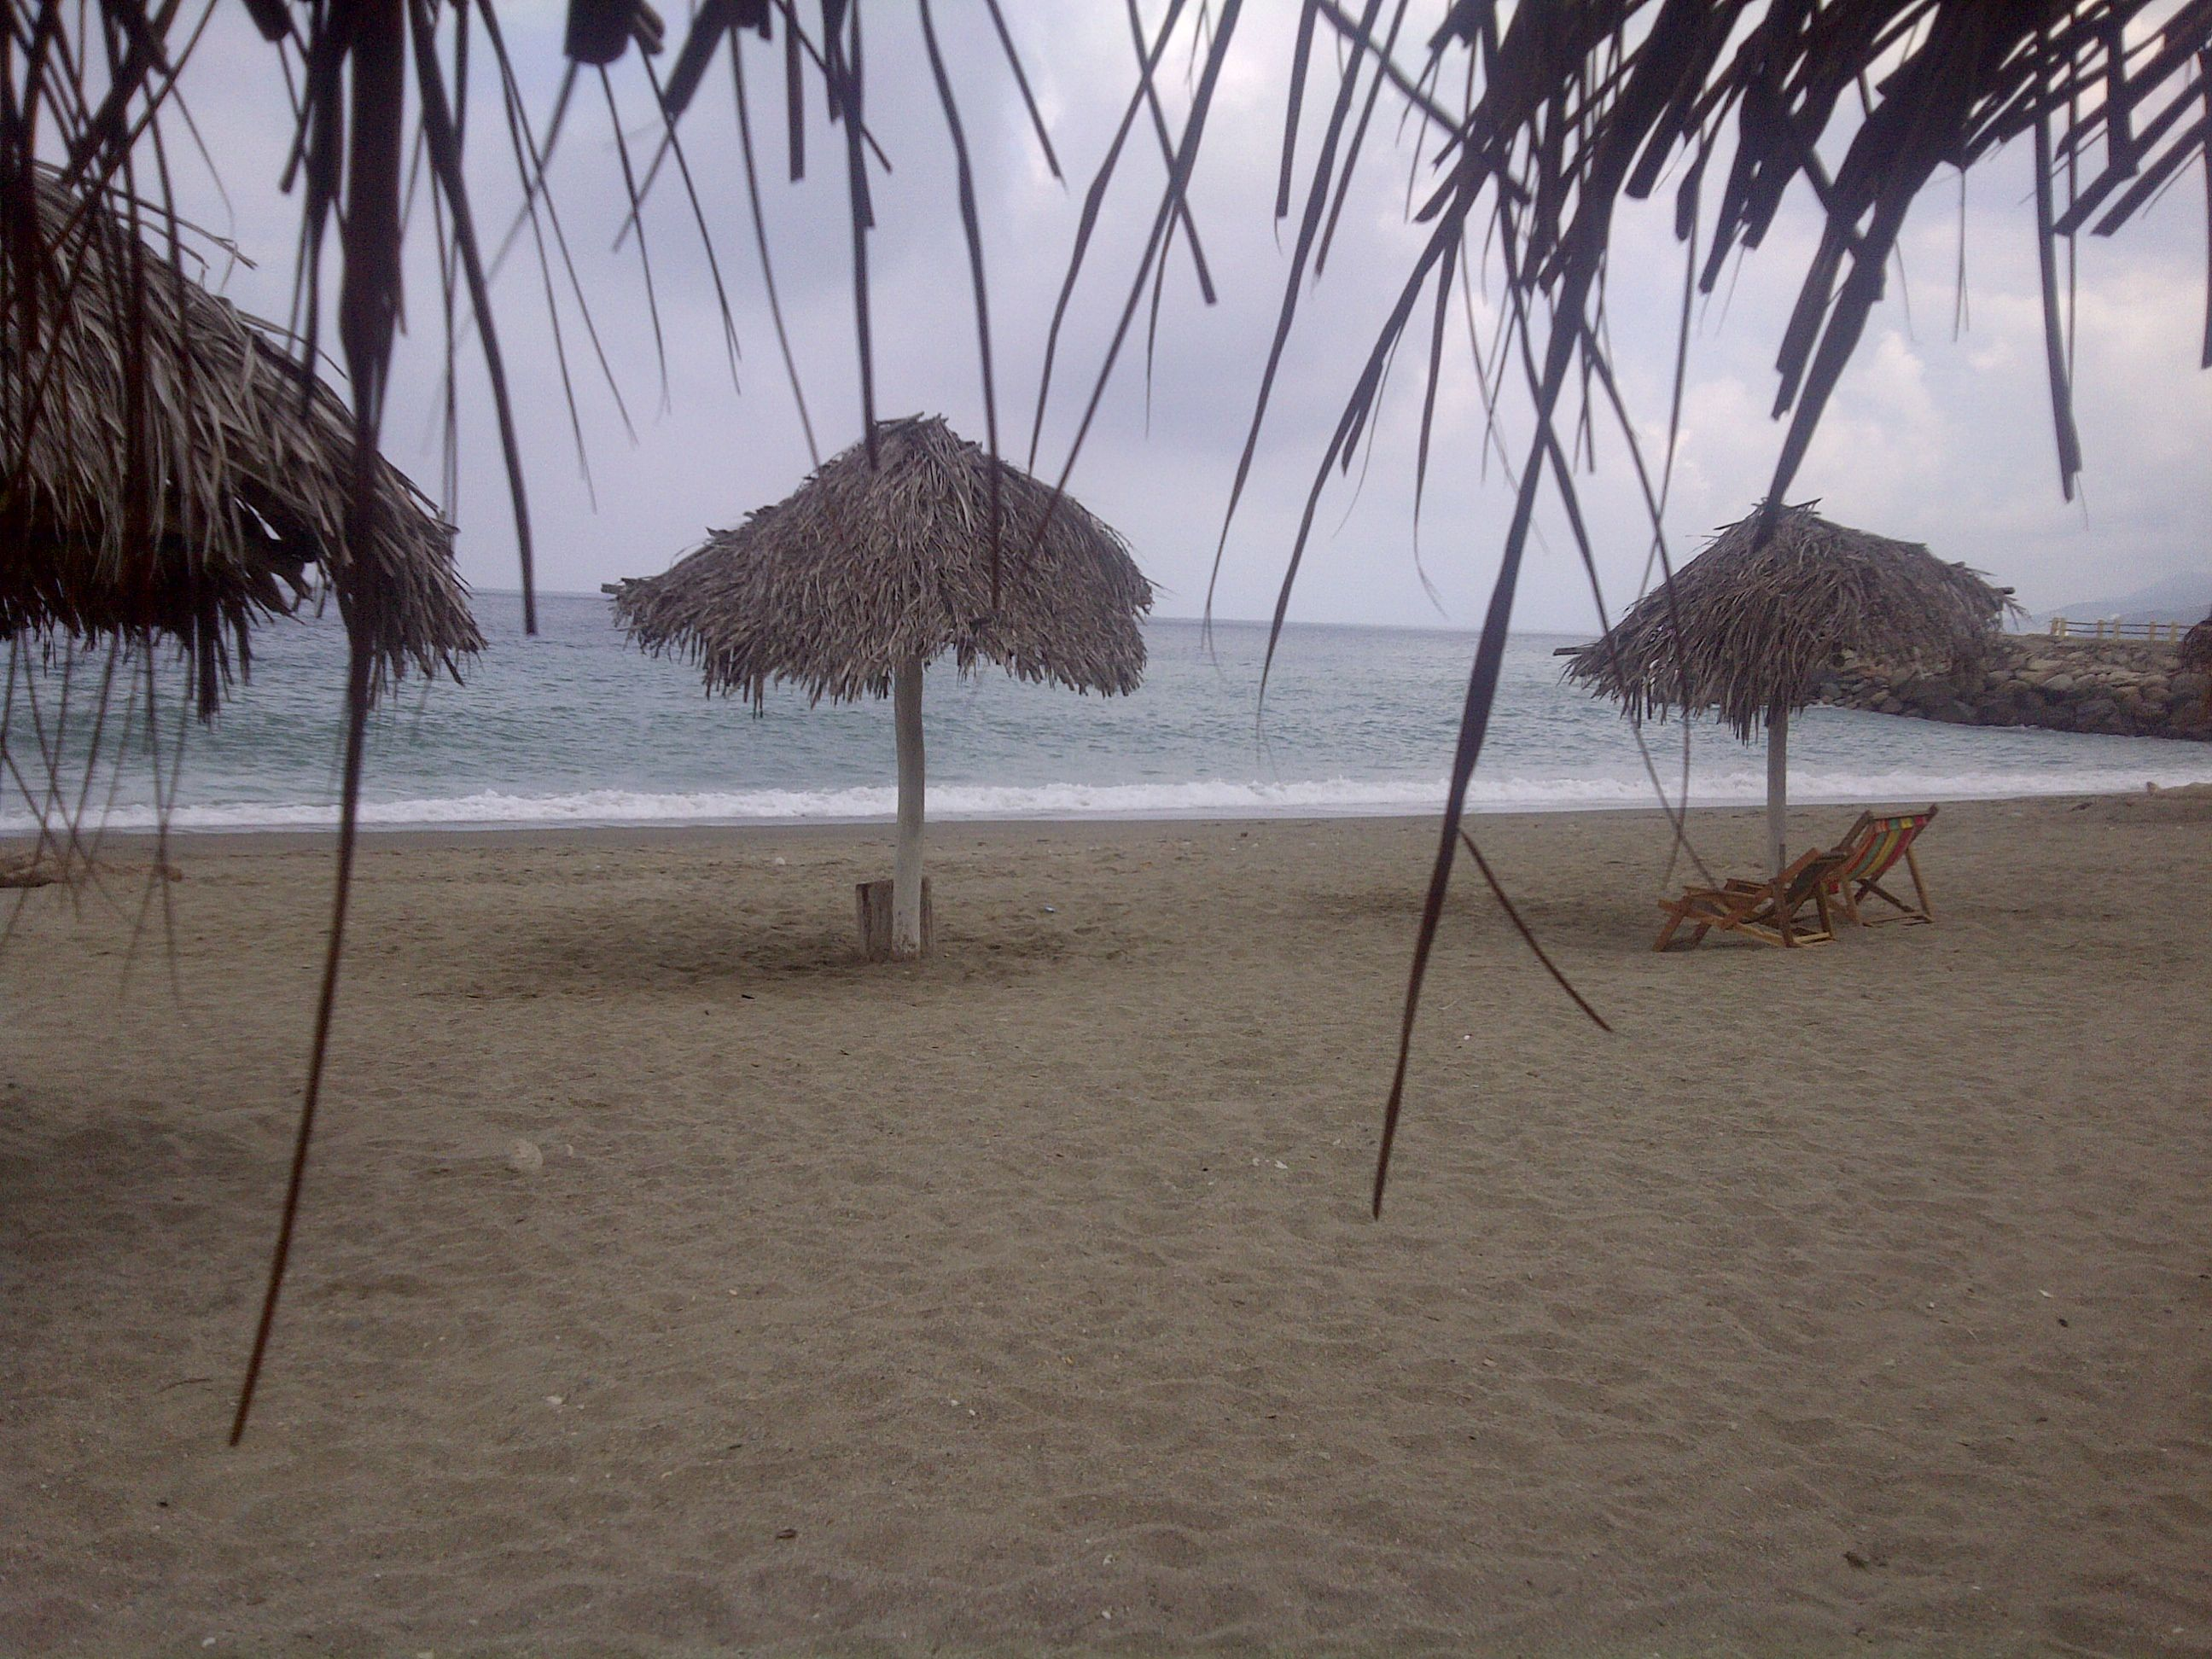 Playa Escondida - Caraballeda - Venezuela